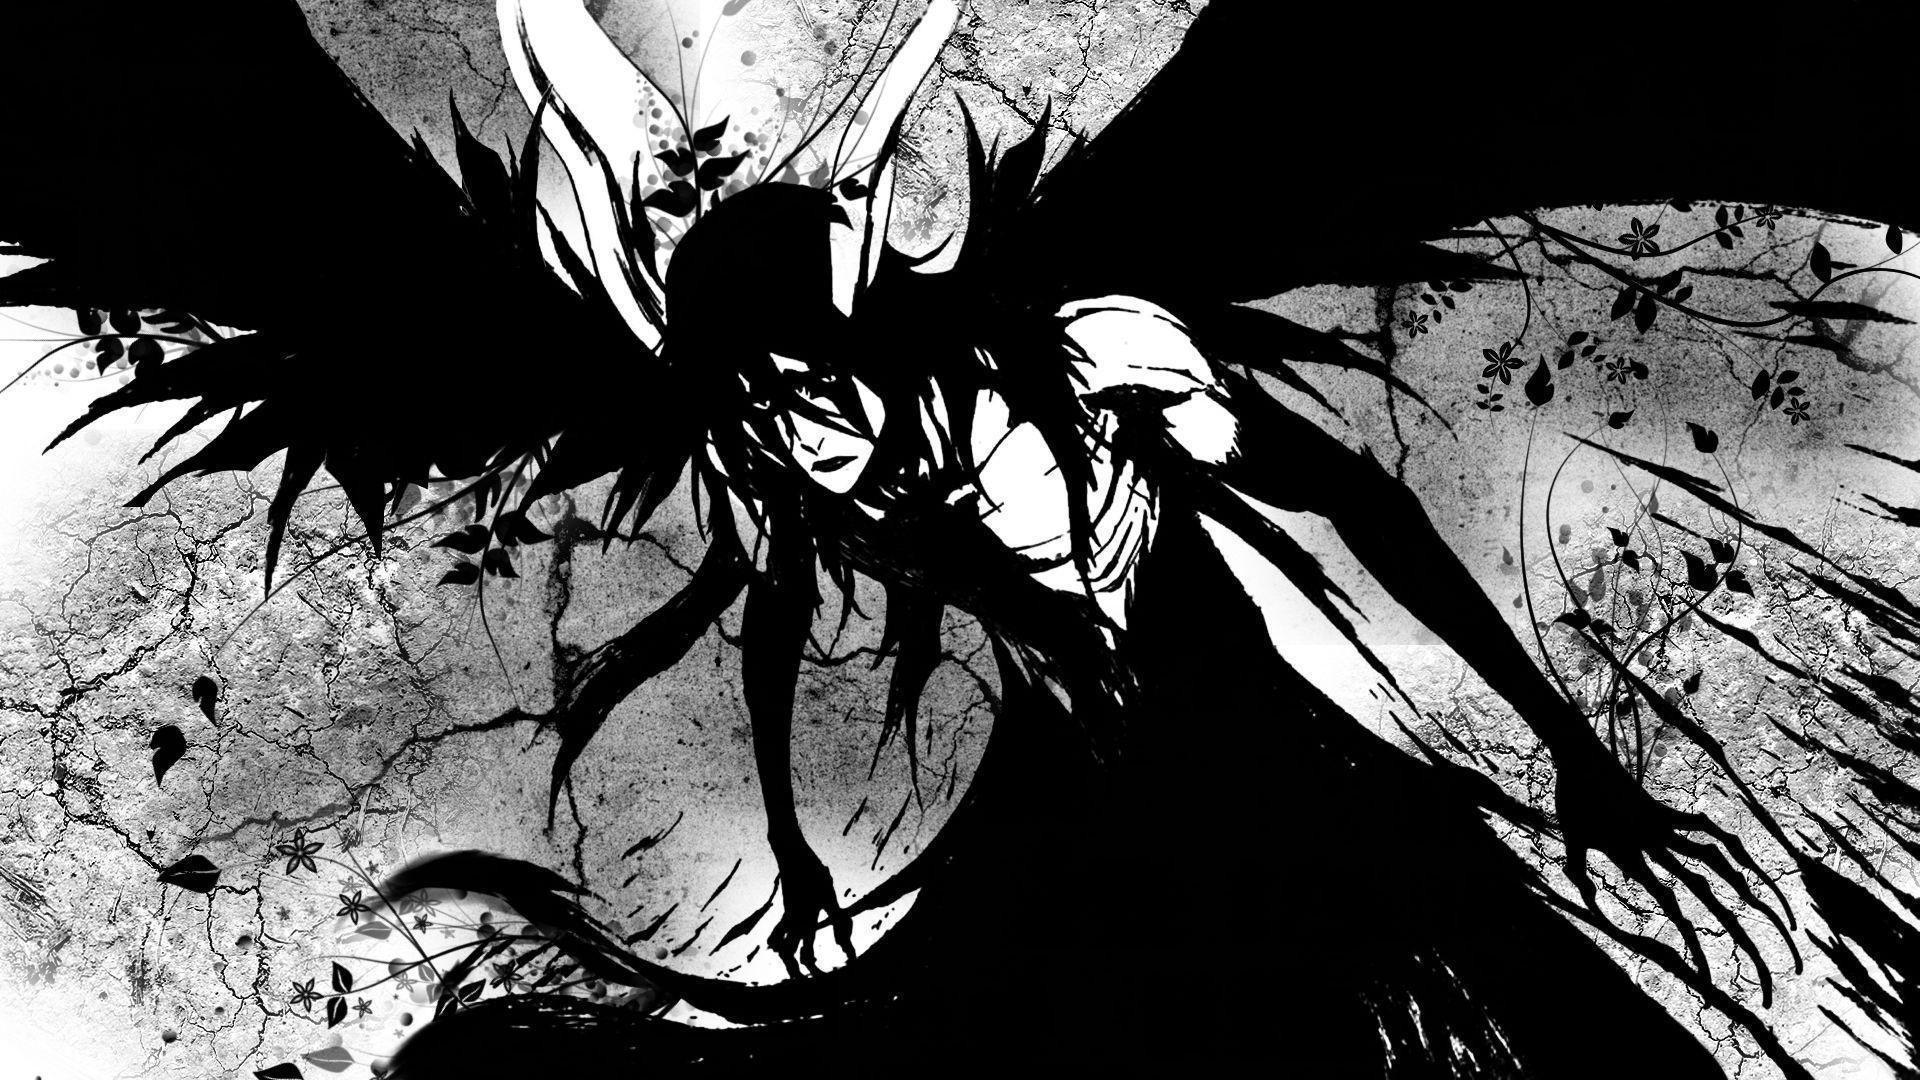 X Download Bleach Espada Manga Ulquiorra Wallpaper X Full